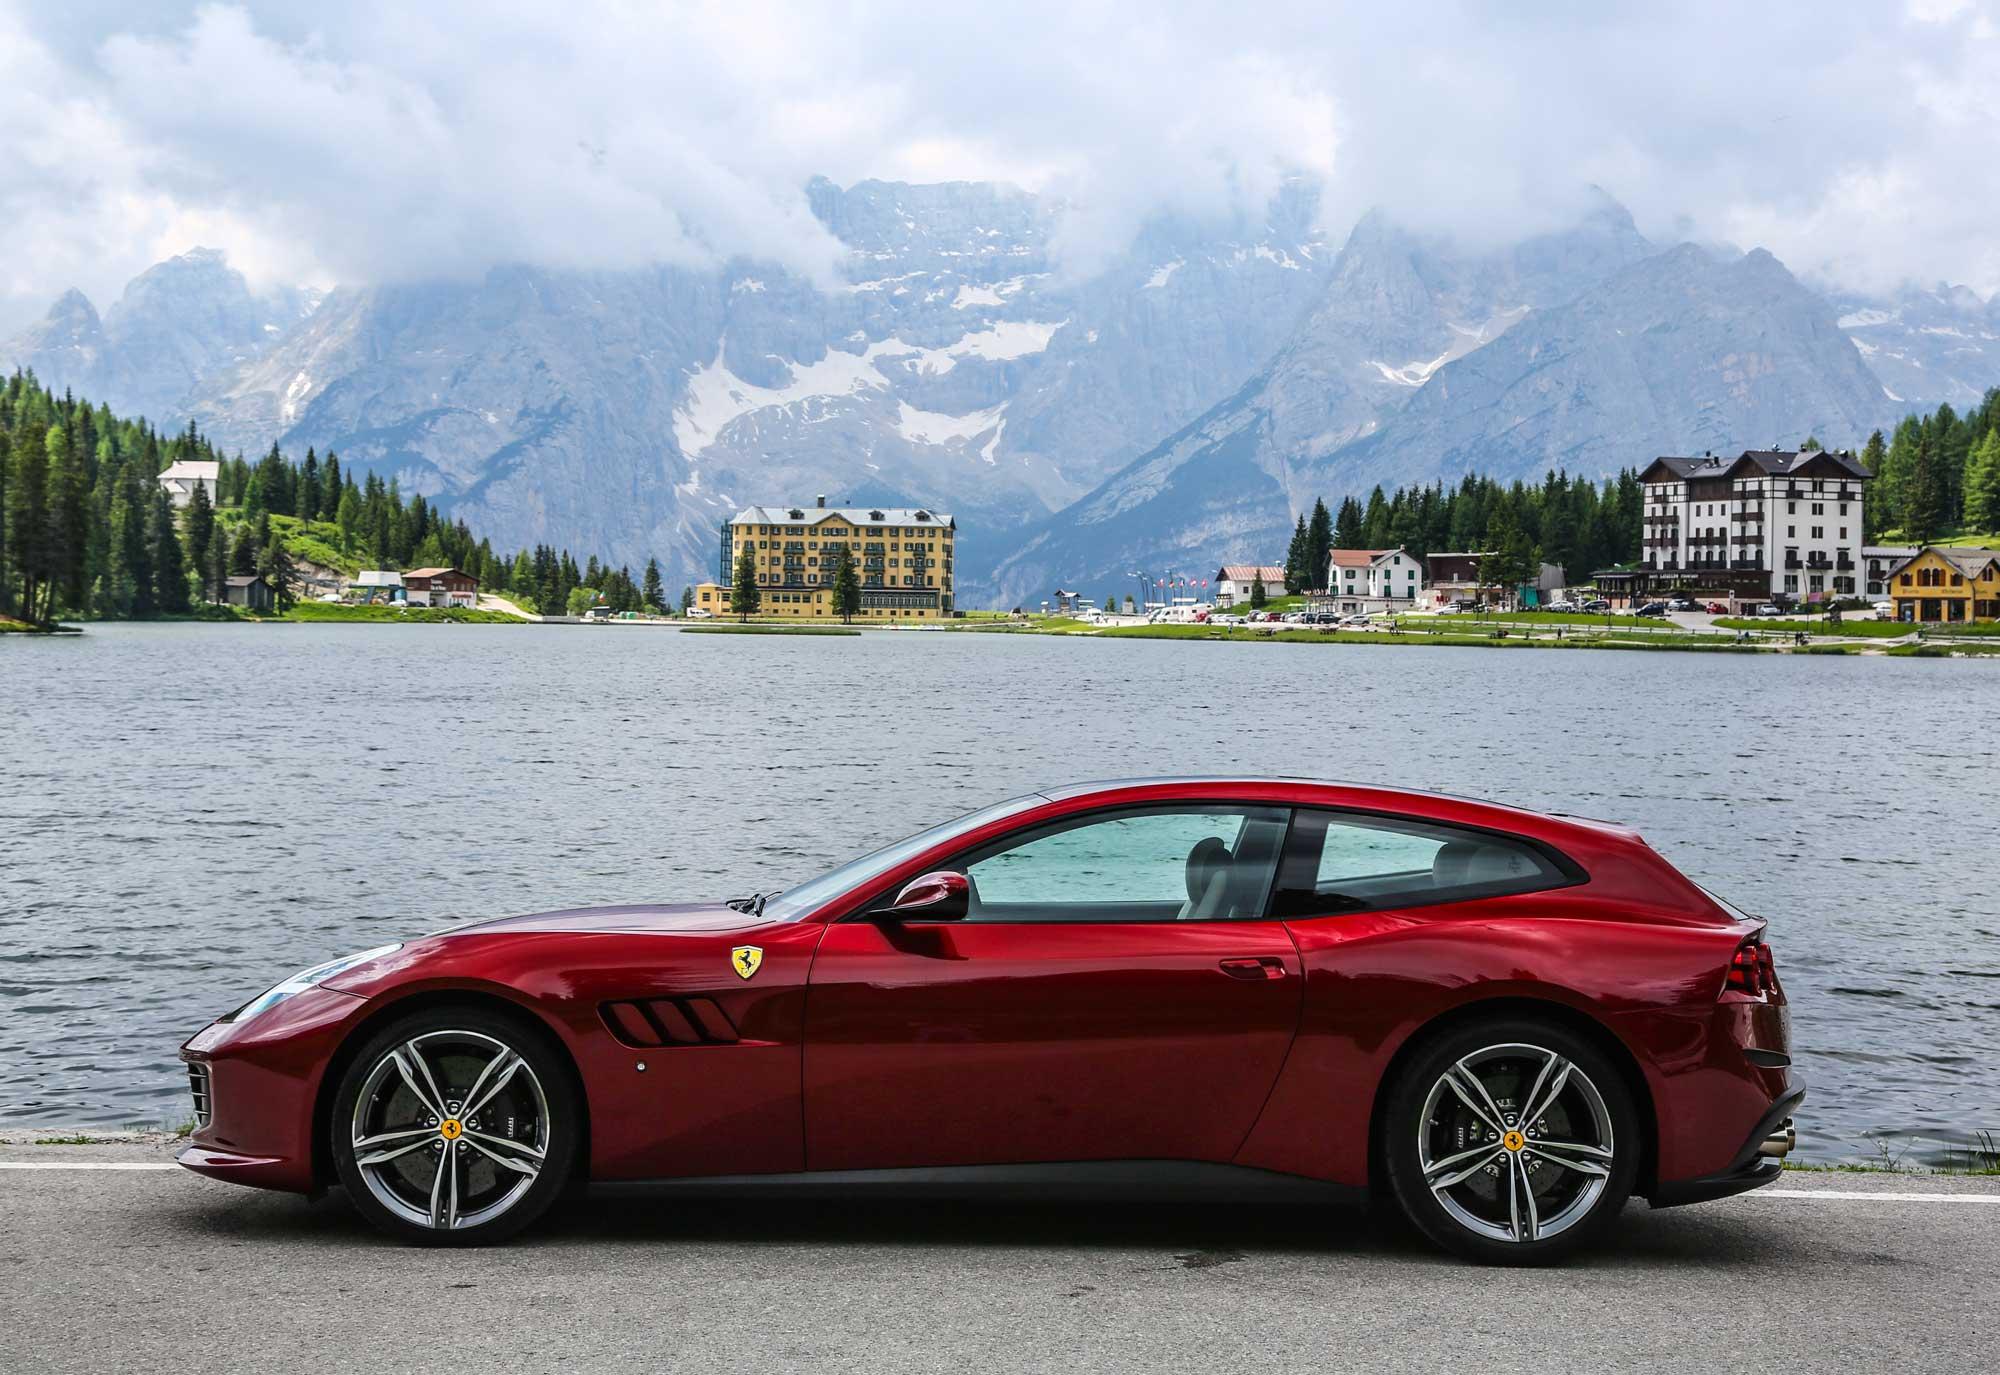 160492-car_Ferrari-GTC4Lusso.jpg